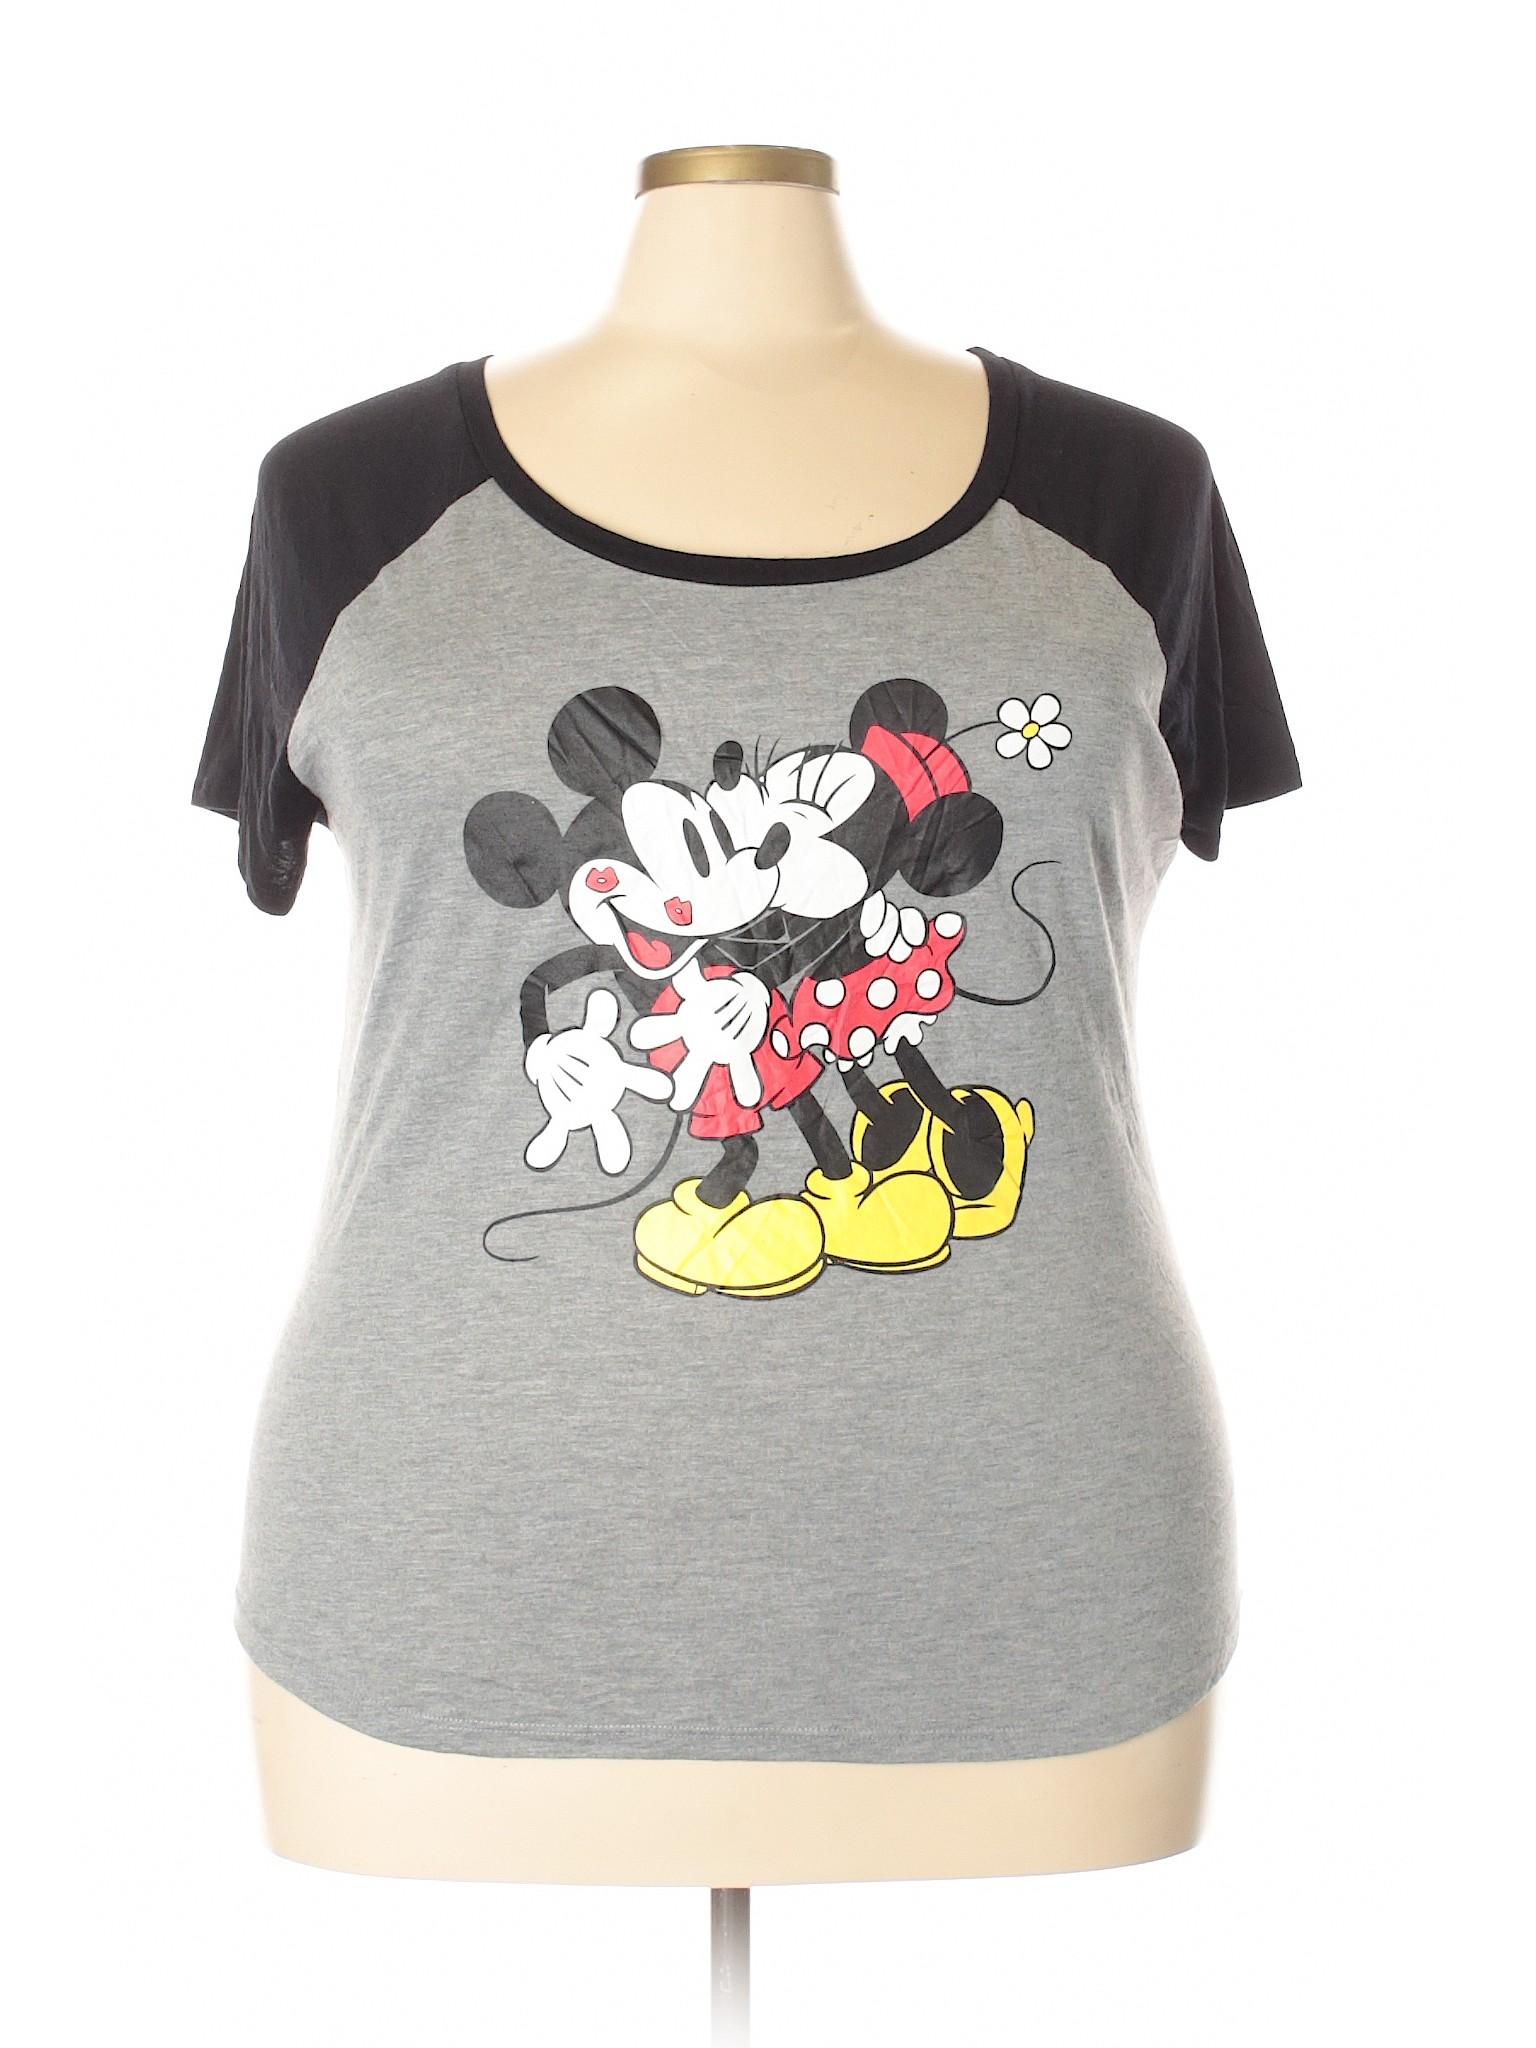 Sweater Boutique winter Boutique Pullover Disney winter Disney Disney Sweater Sweater Pullover Boutique winter Pullover 4CwxgwXtq